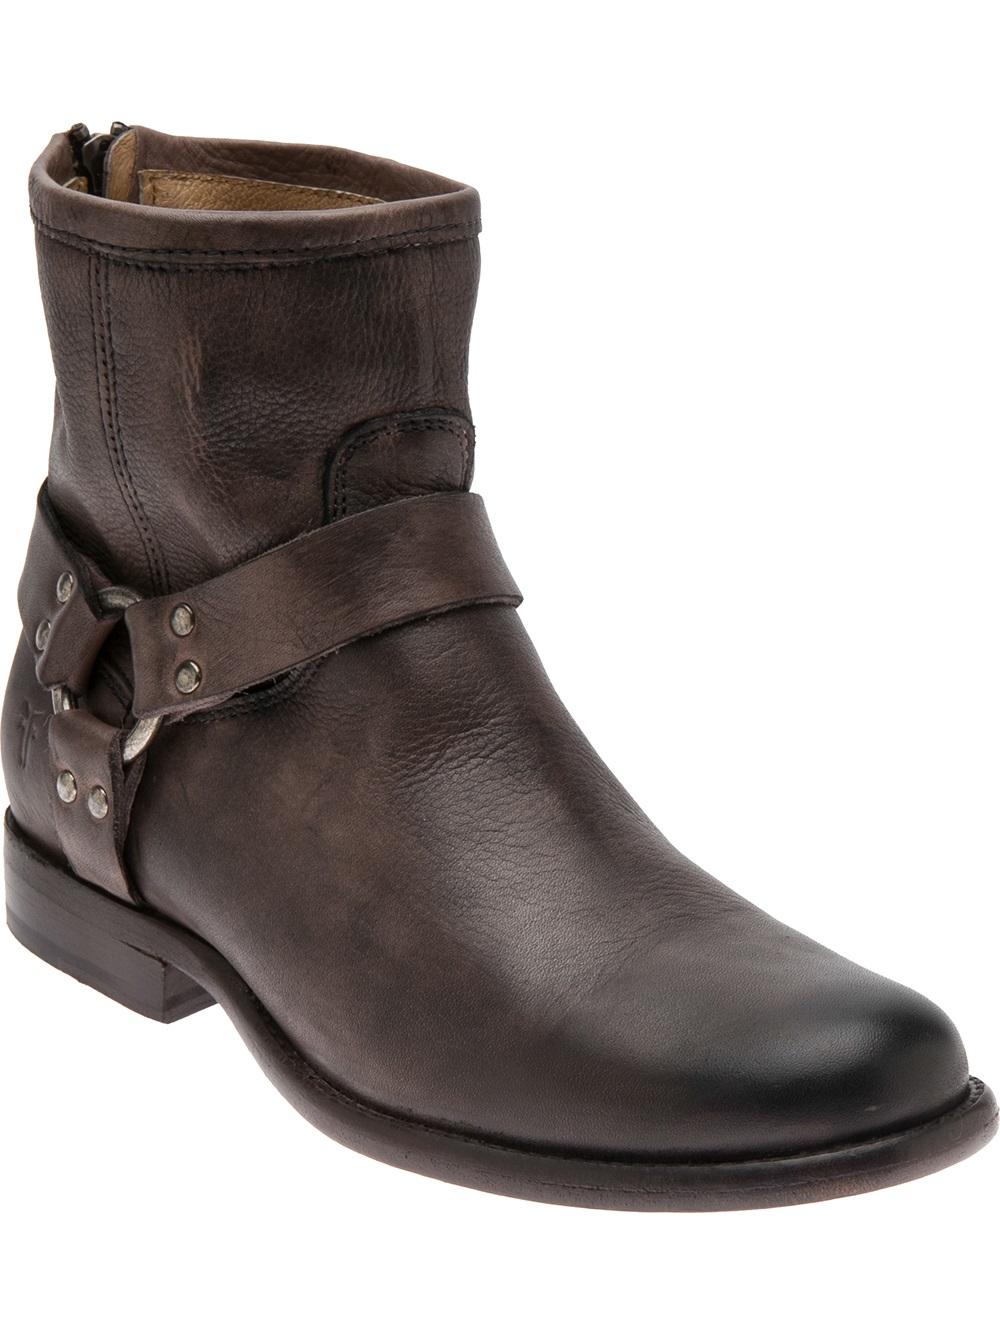 Frye Phillip Harness Short Boot In Grey Brown Lyst